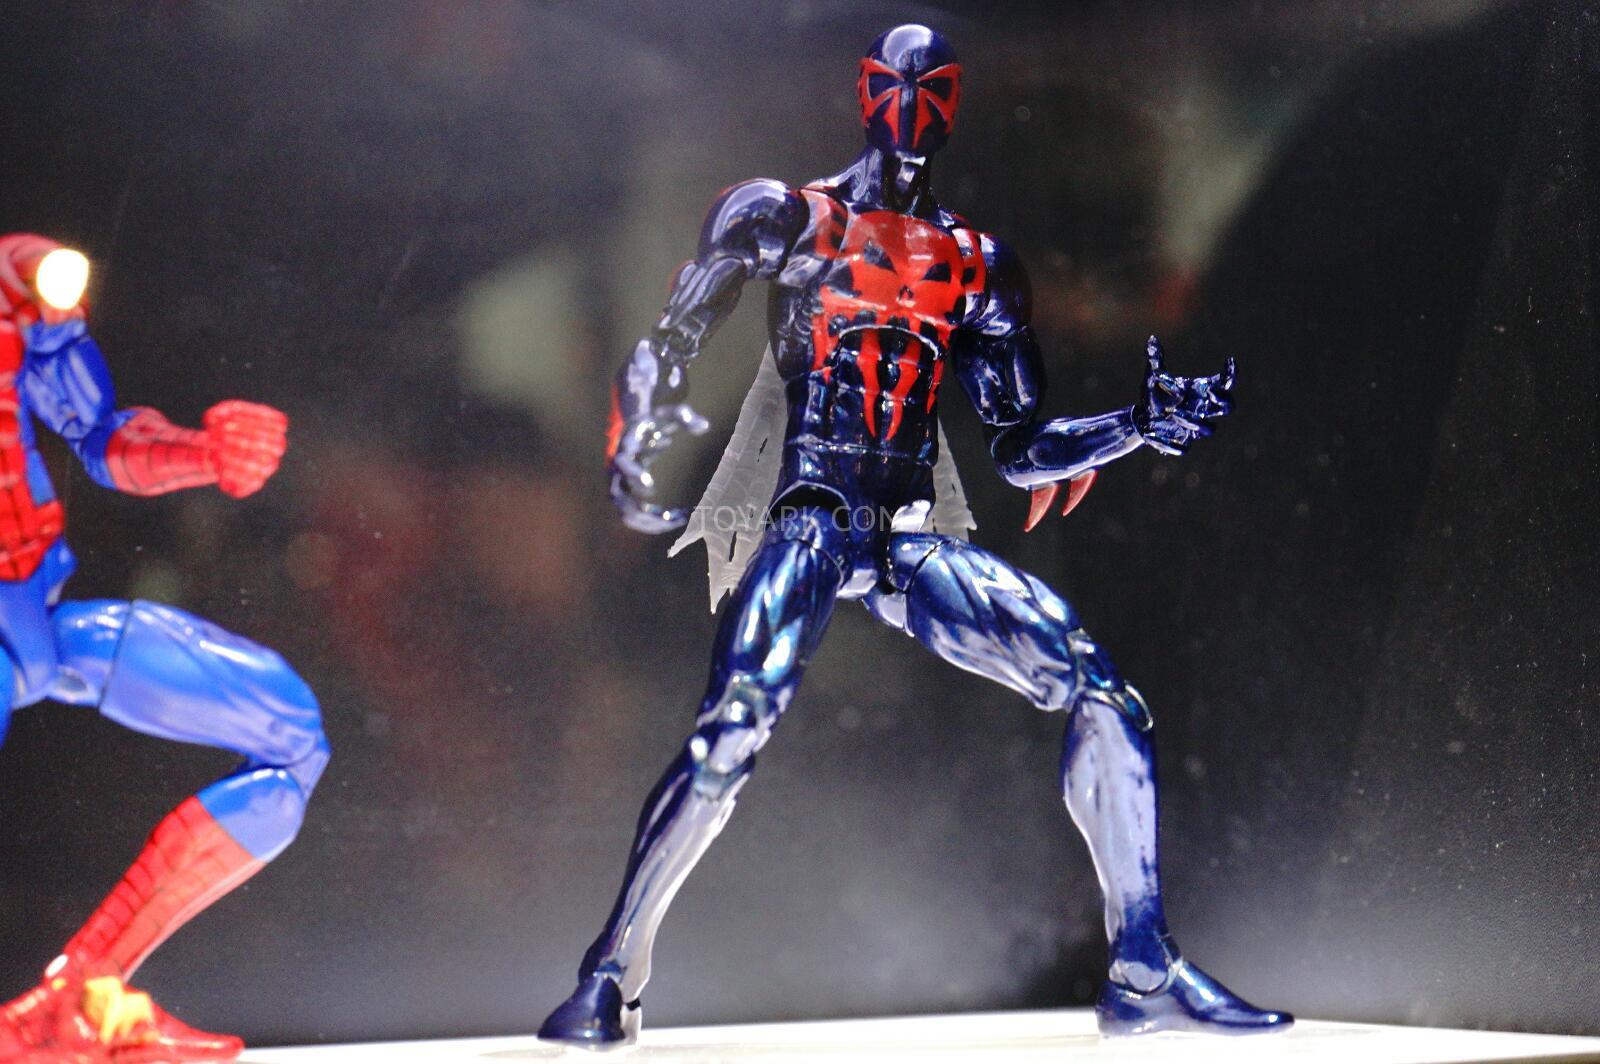 Scarlet Spider vs Spider Man 2099 Sdcc-2014-spider-man-2099